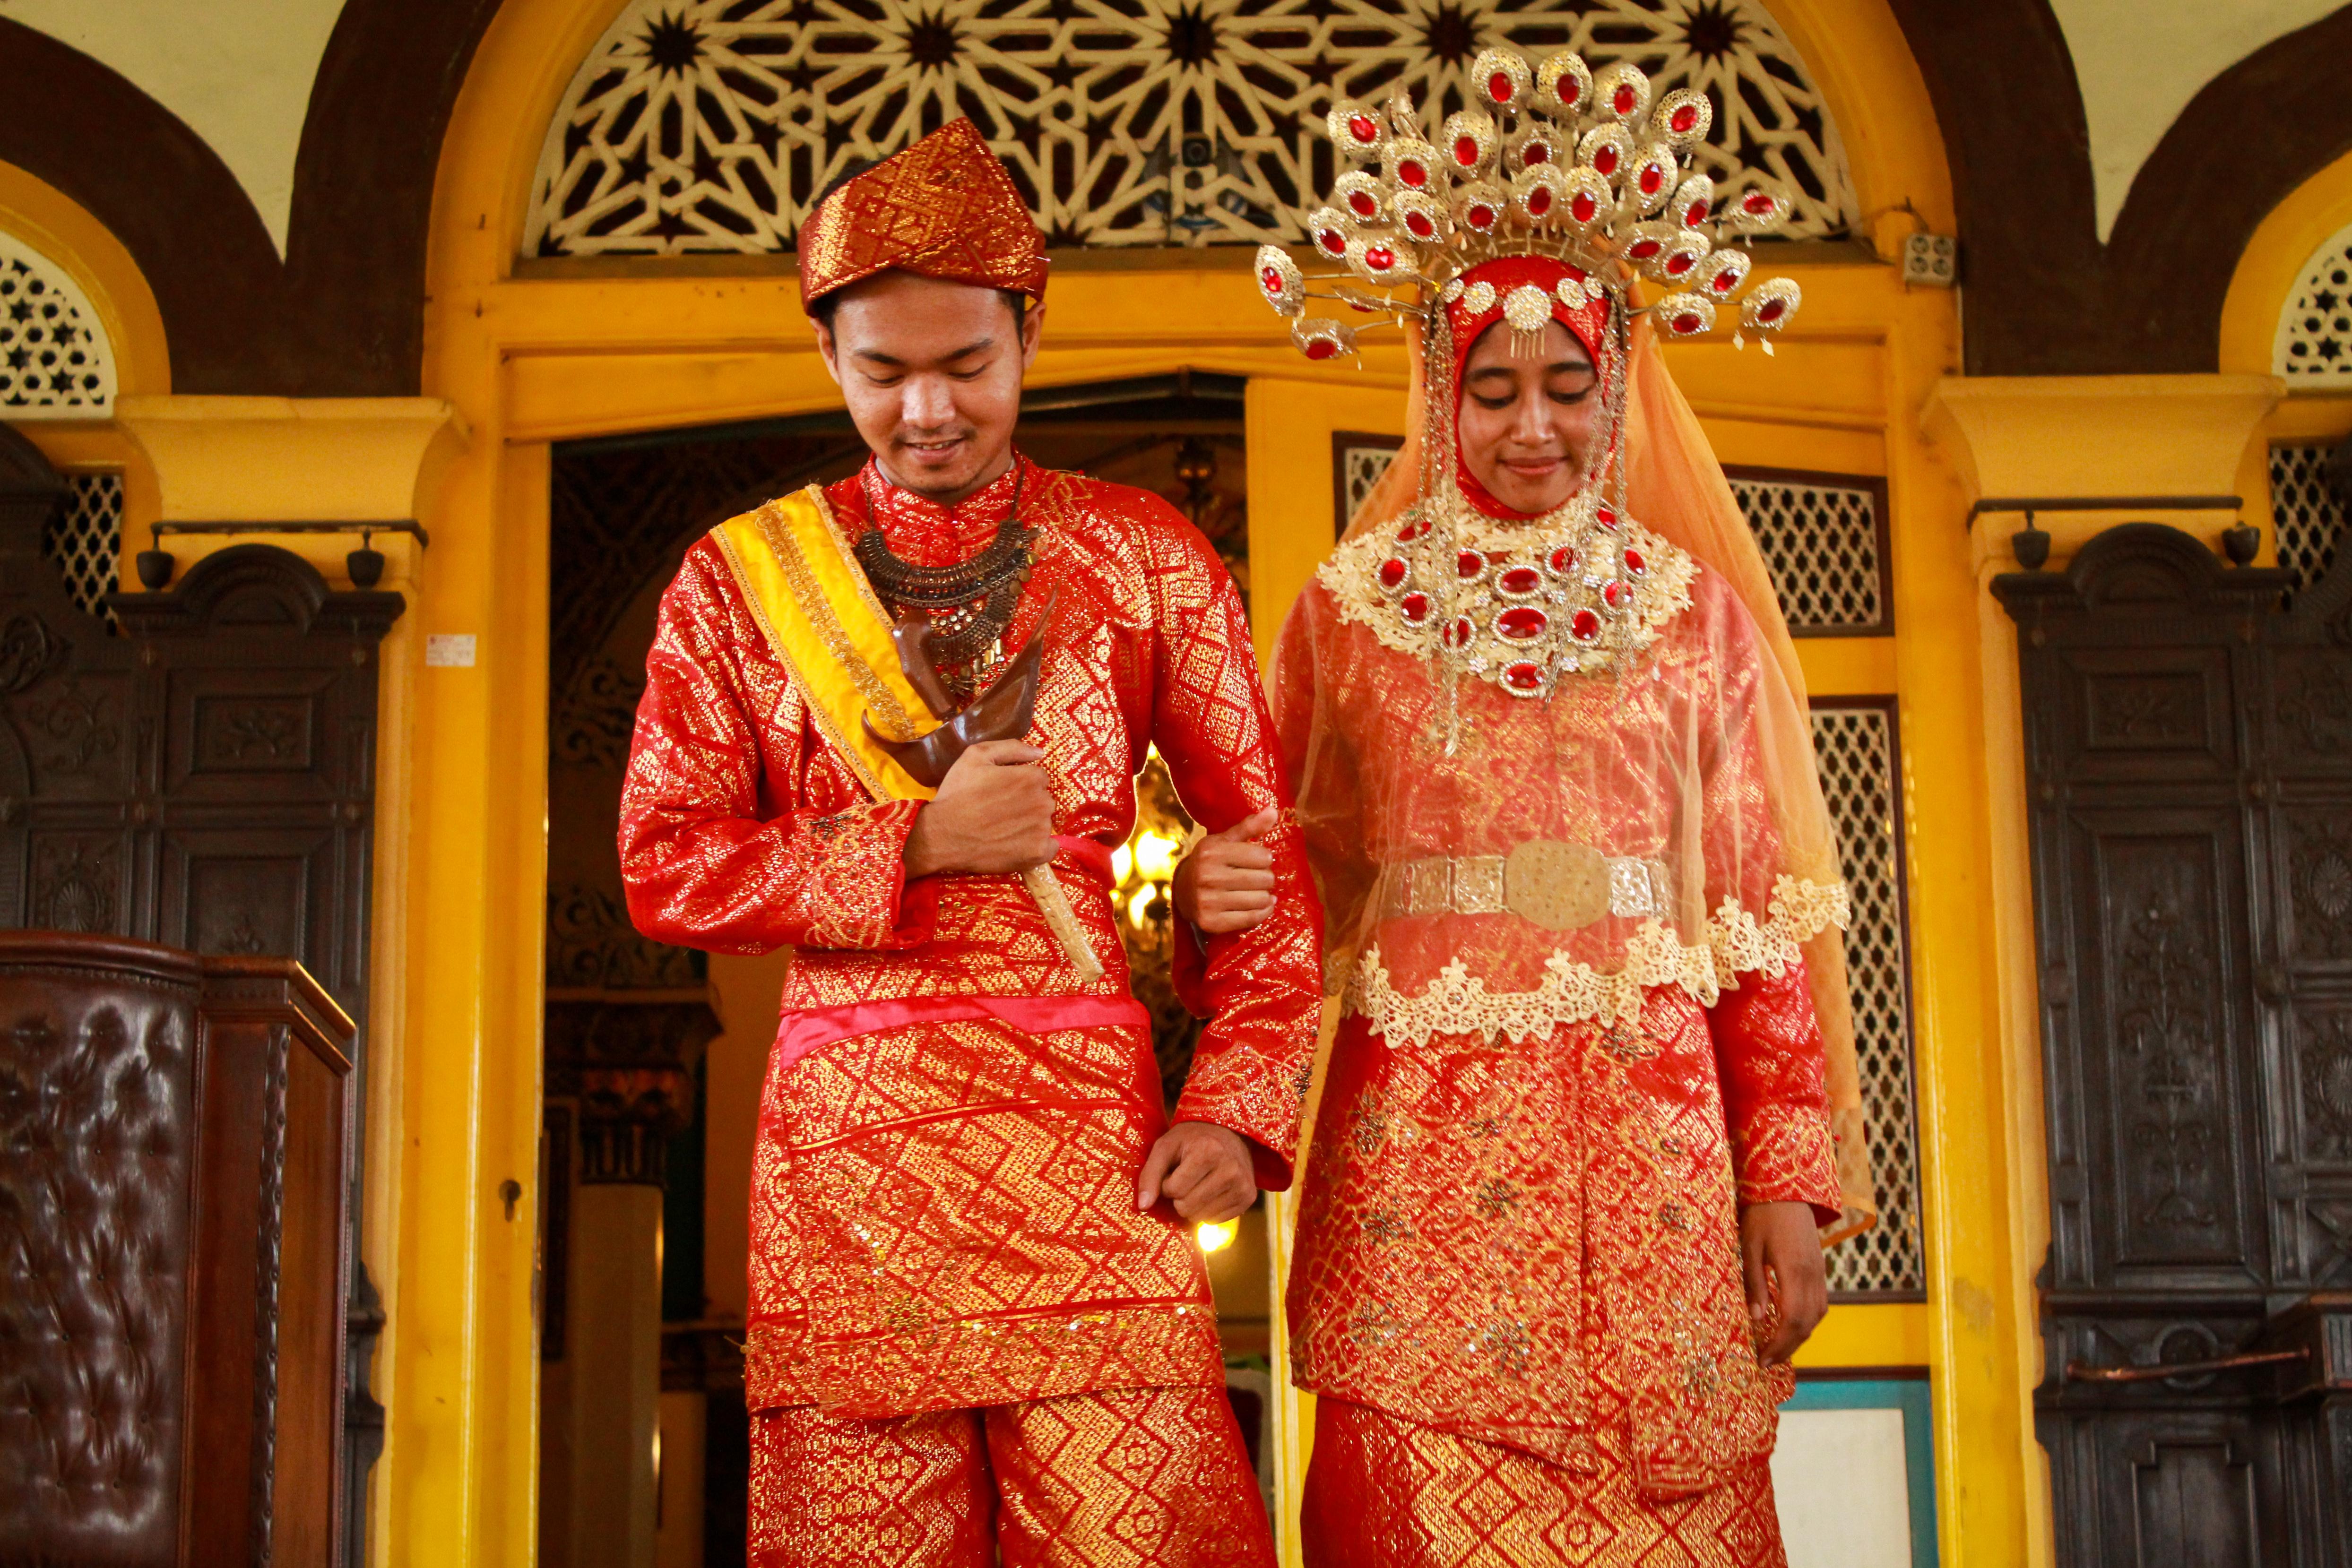 File:Pengantin Memakai Pakaian Adat Melayu Deli.jpg - Wikimedia